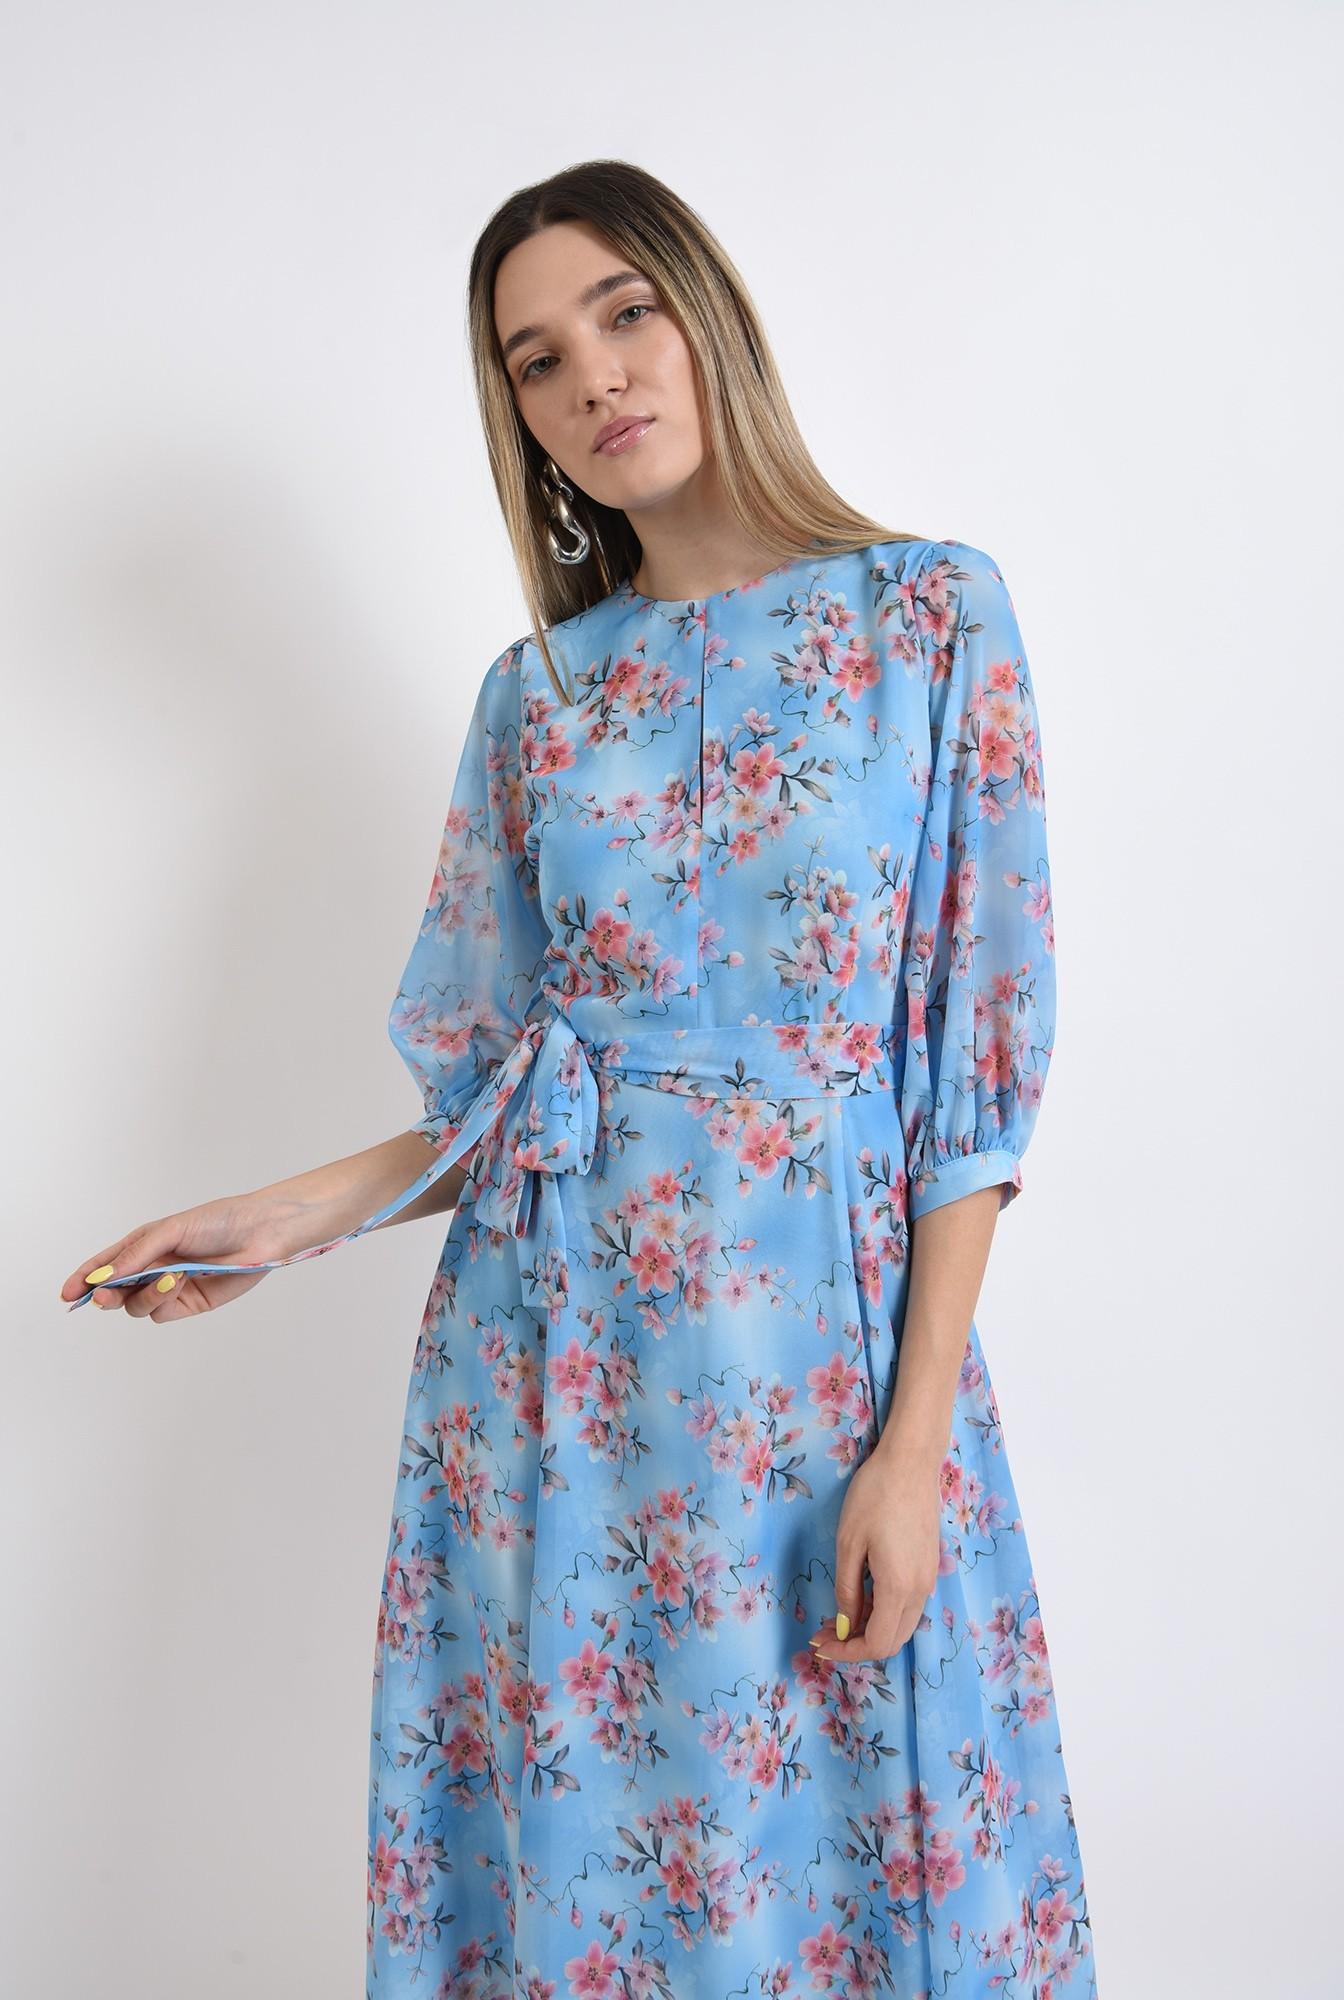 2 - rochie eleganta, poema, bleu, cu flori, midi